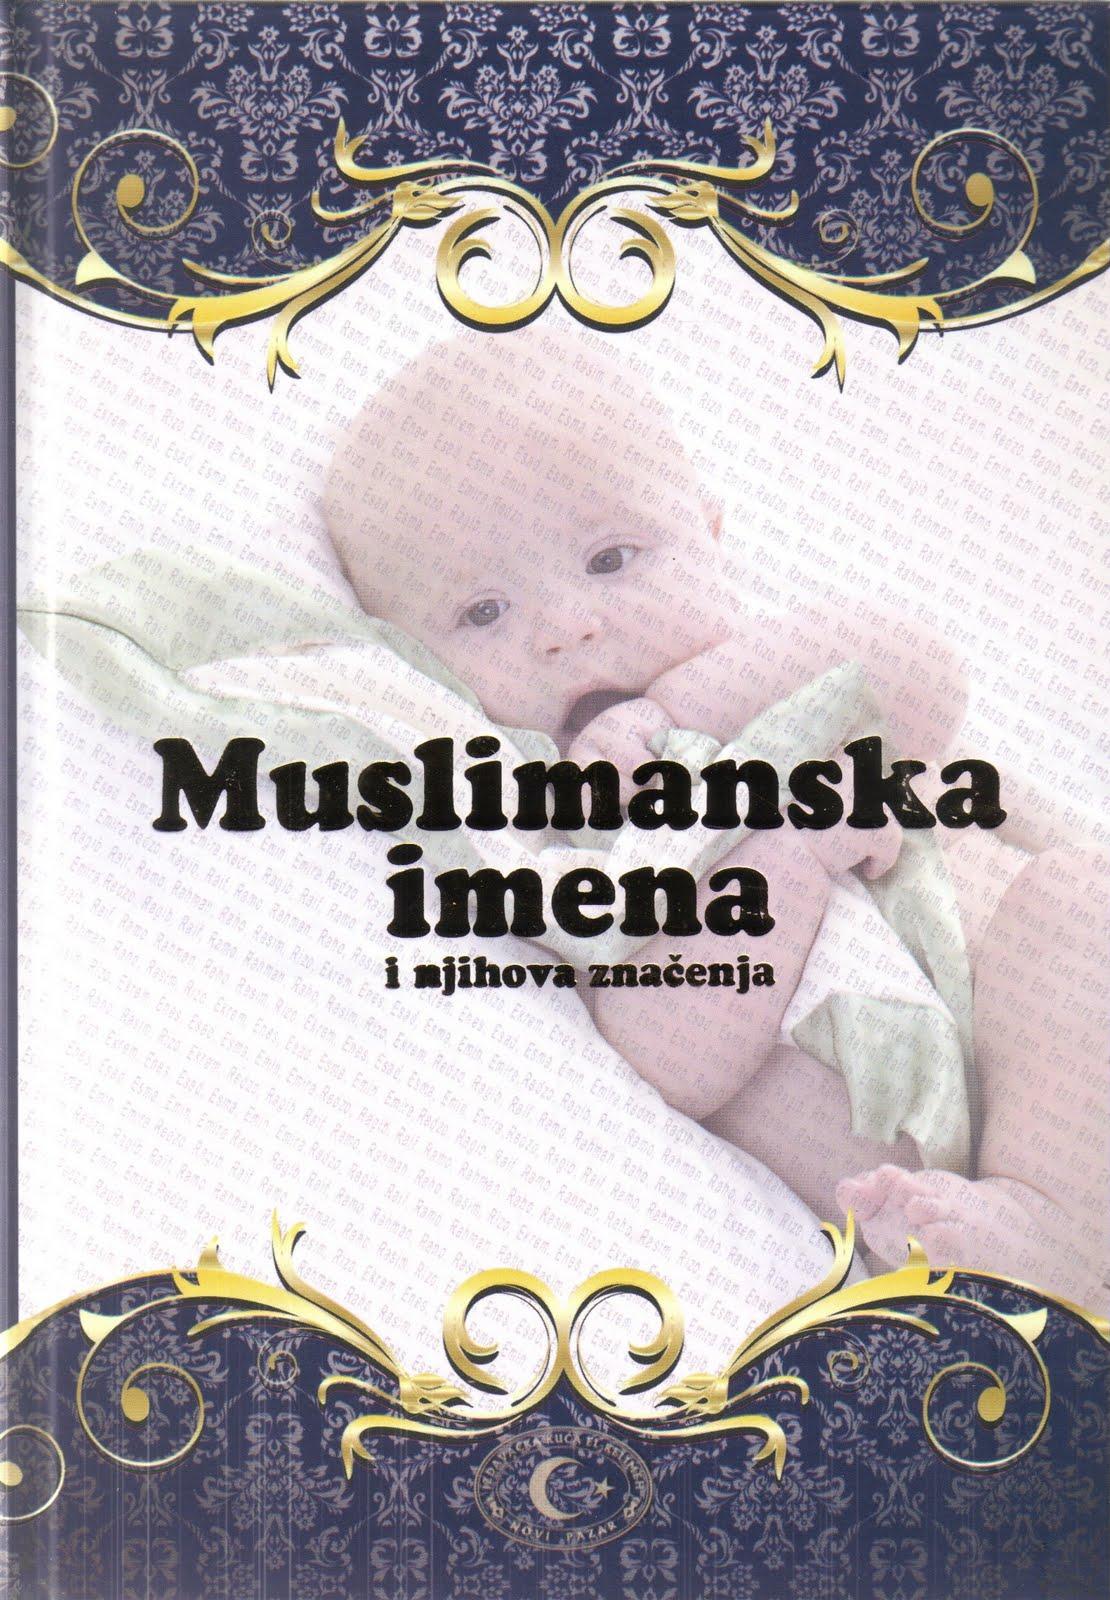 MUSLIMANSKA IMENA 2010 - Page 2